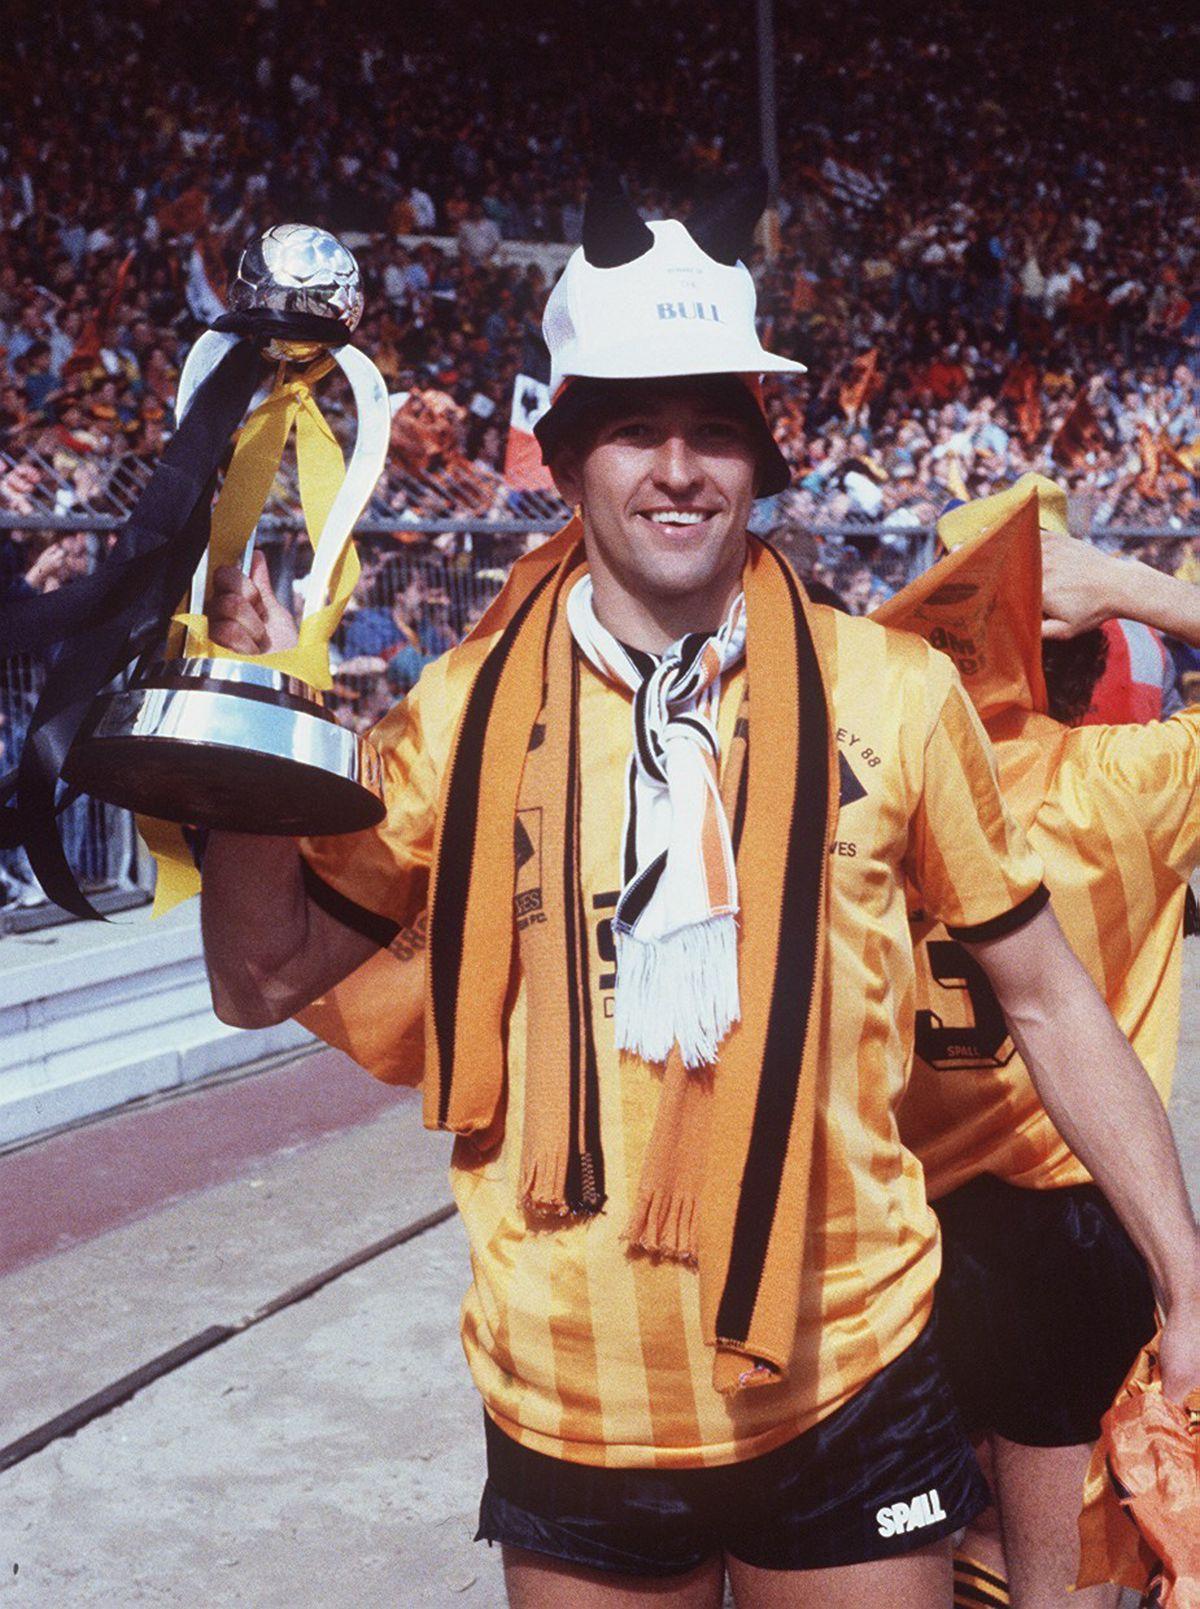 WOLVES/BURNLEY, SHERPA VAN FINAL,  AT WEMBLEY IN 1988